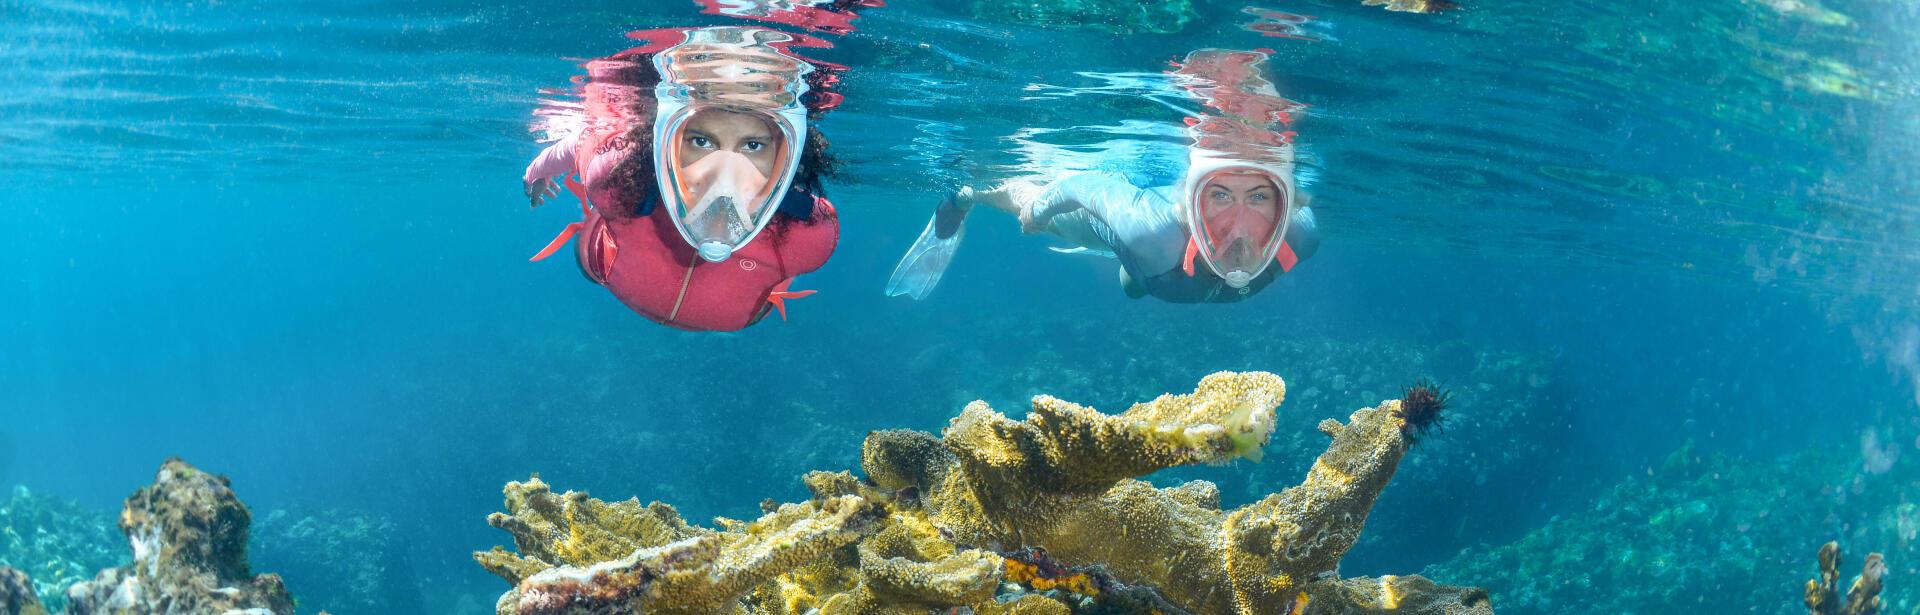 snorkeling, randonnée palmée